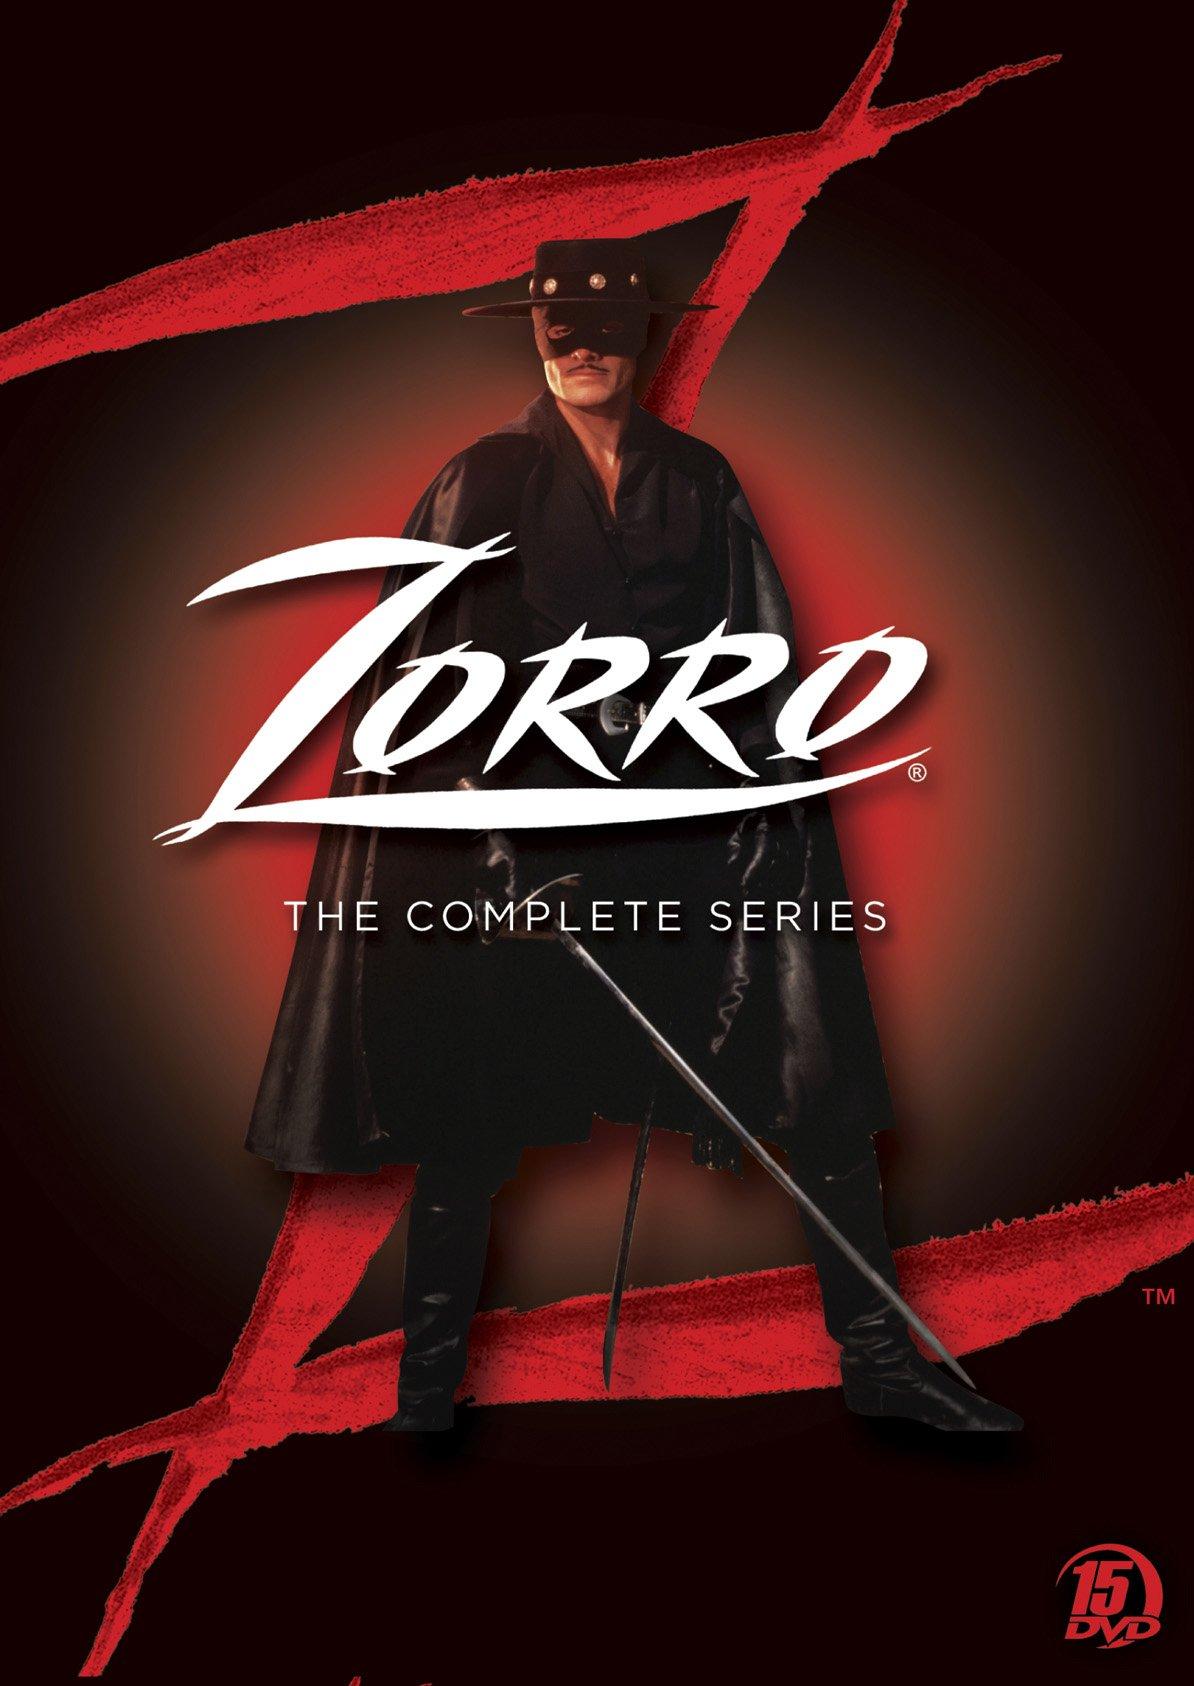 Zorro:complt Series Dvd Set